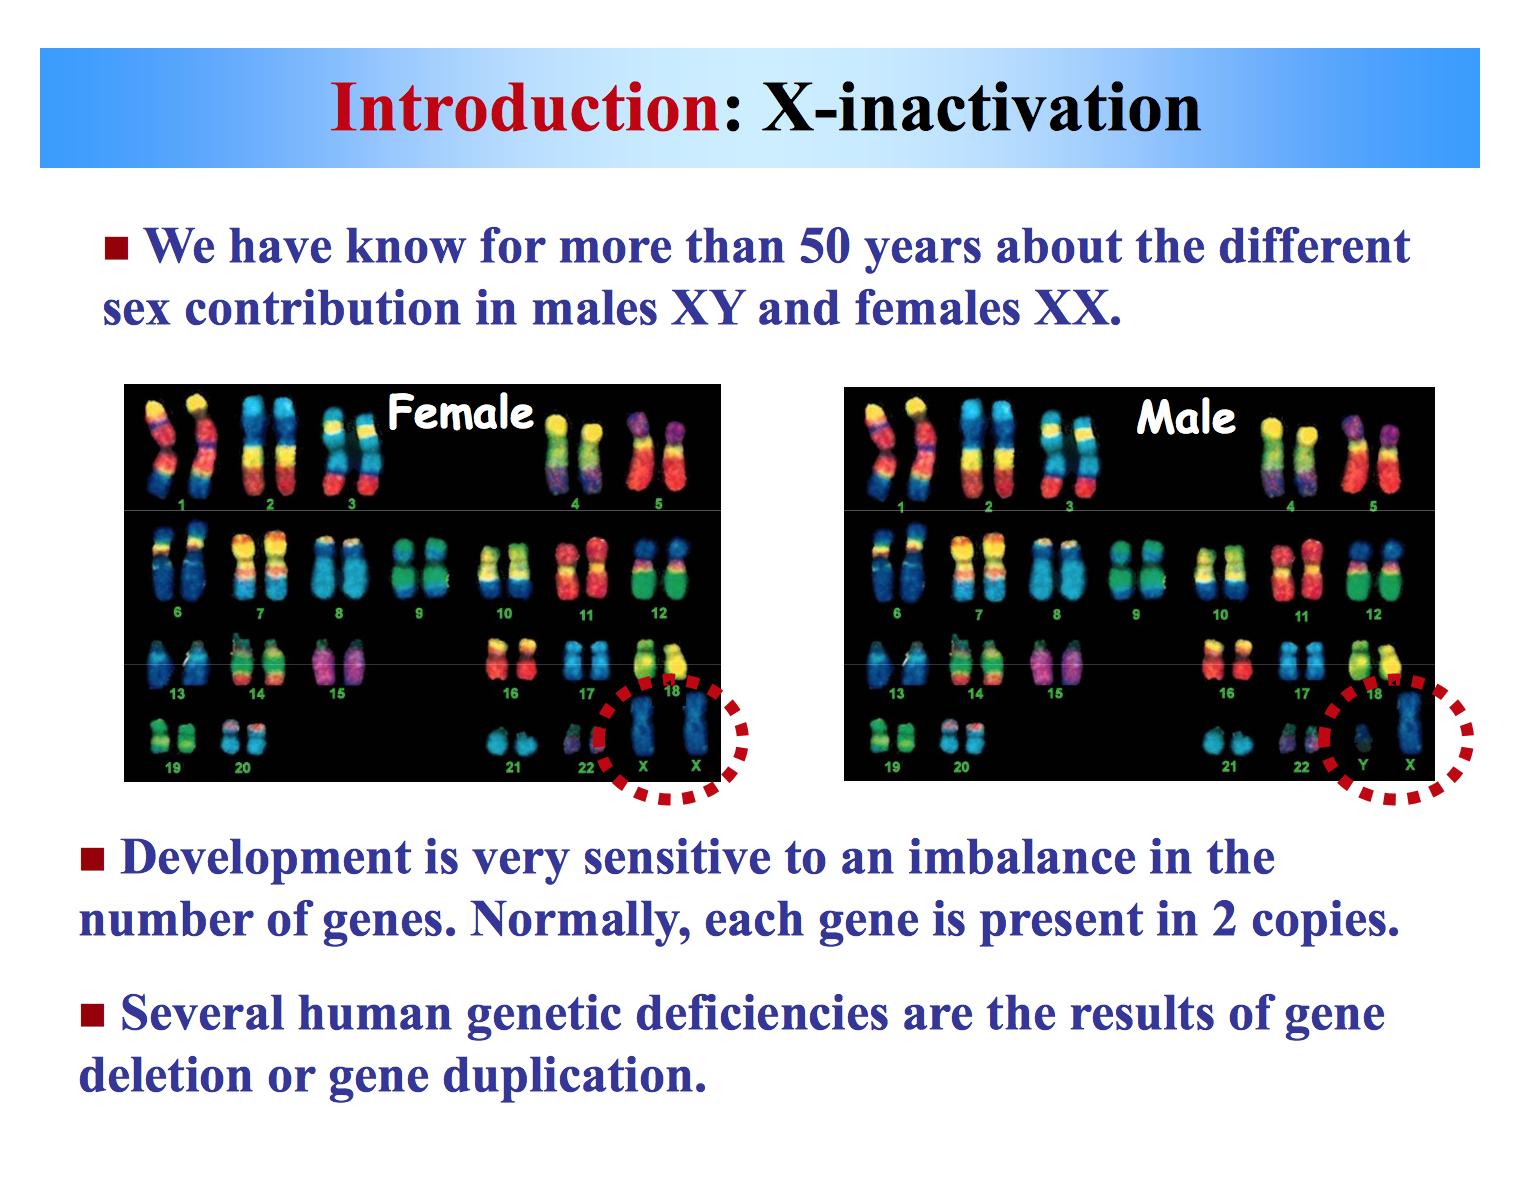 Pity, that Male pattern baldness sexlinked gene